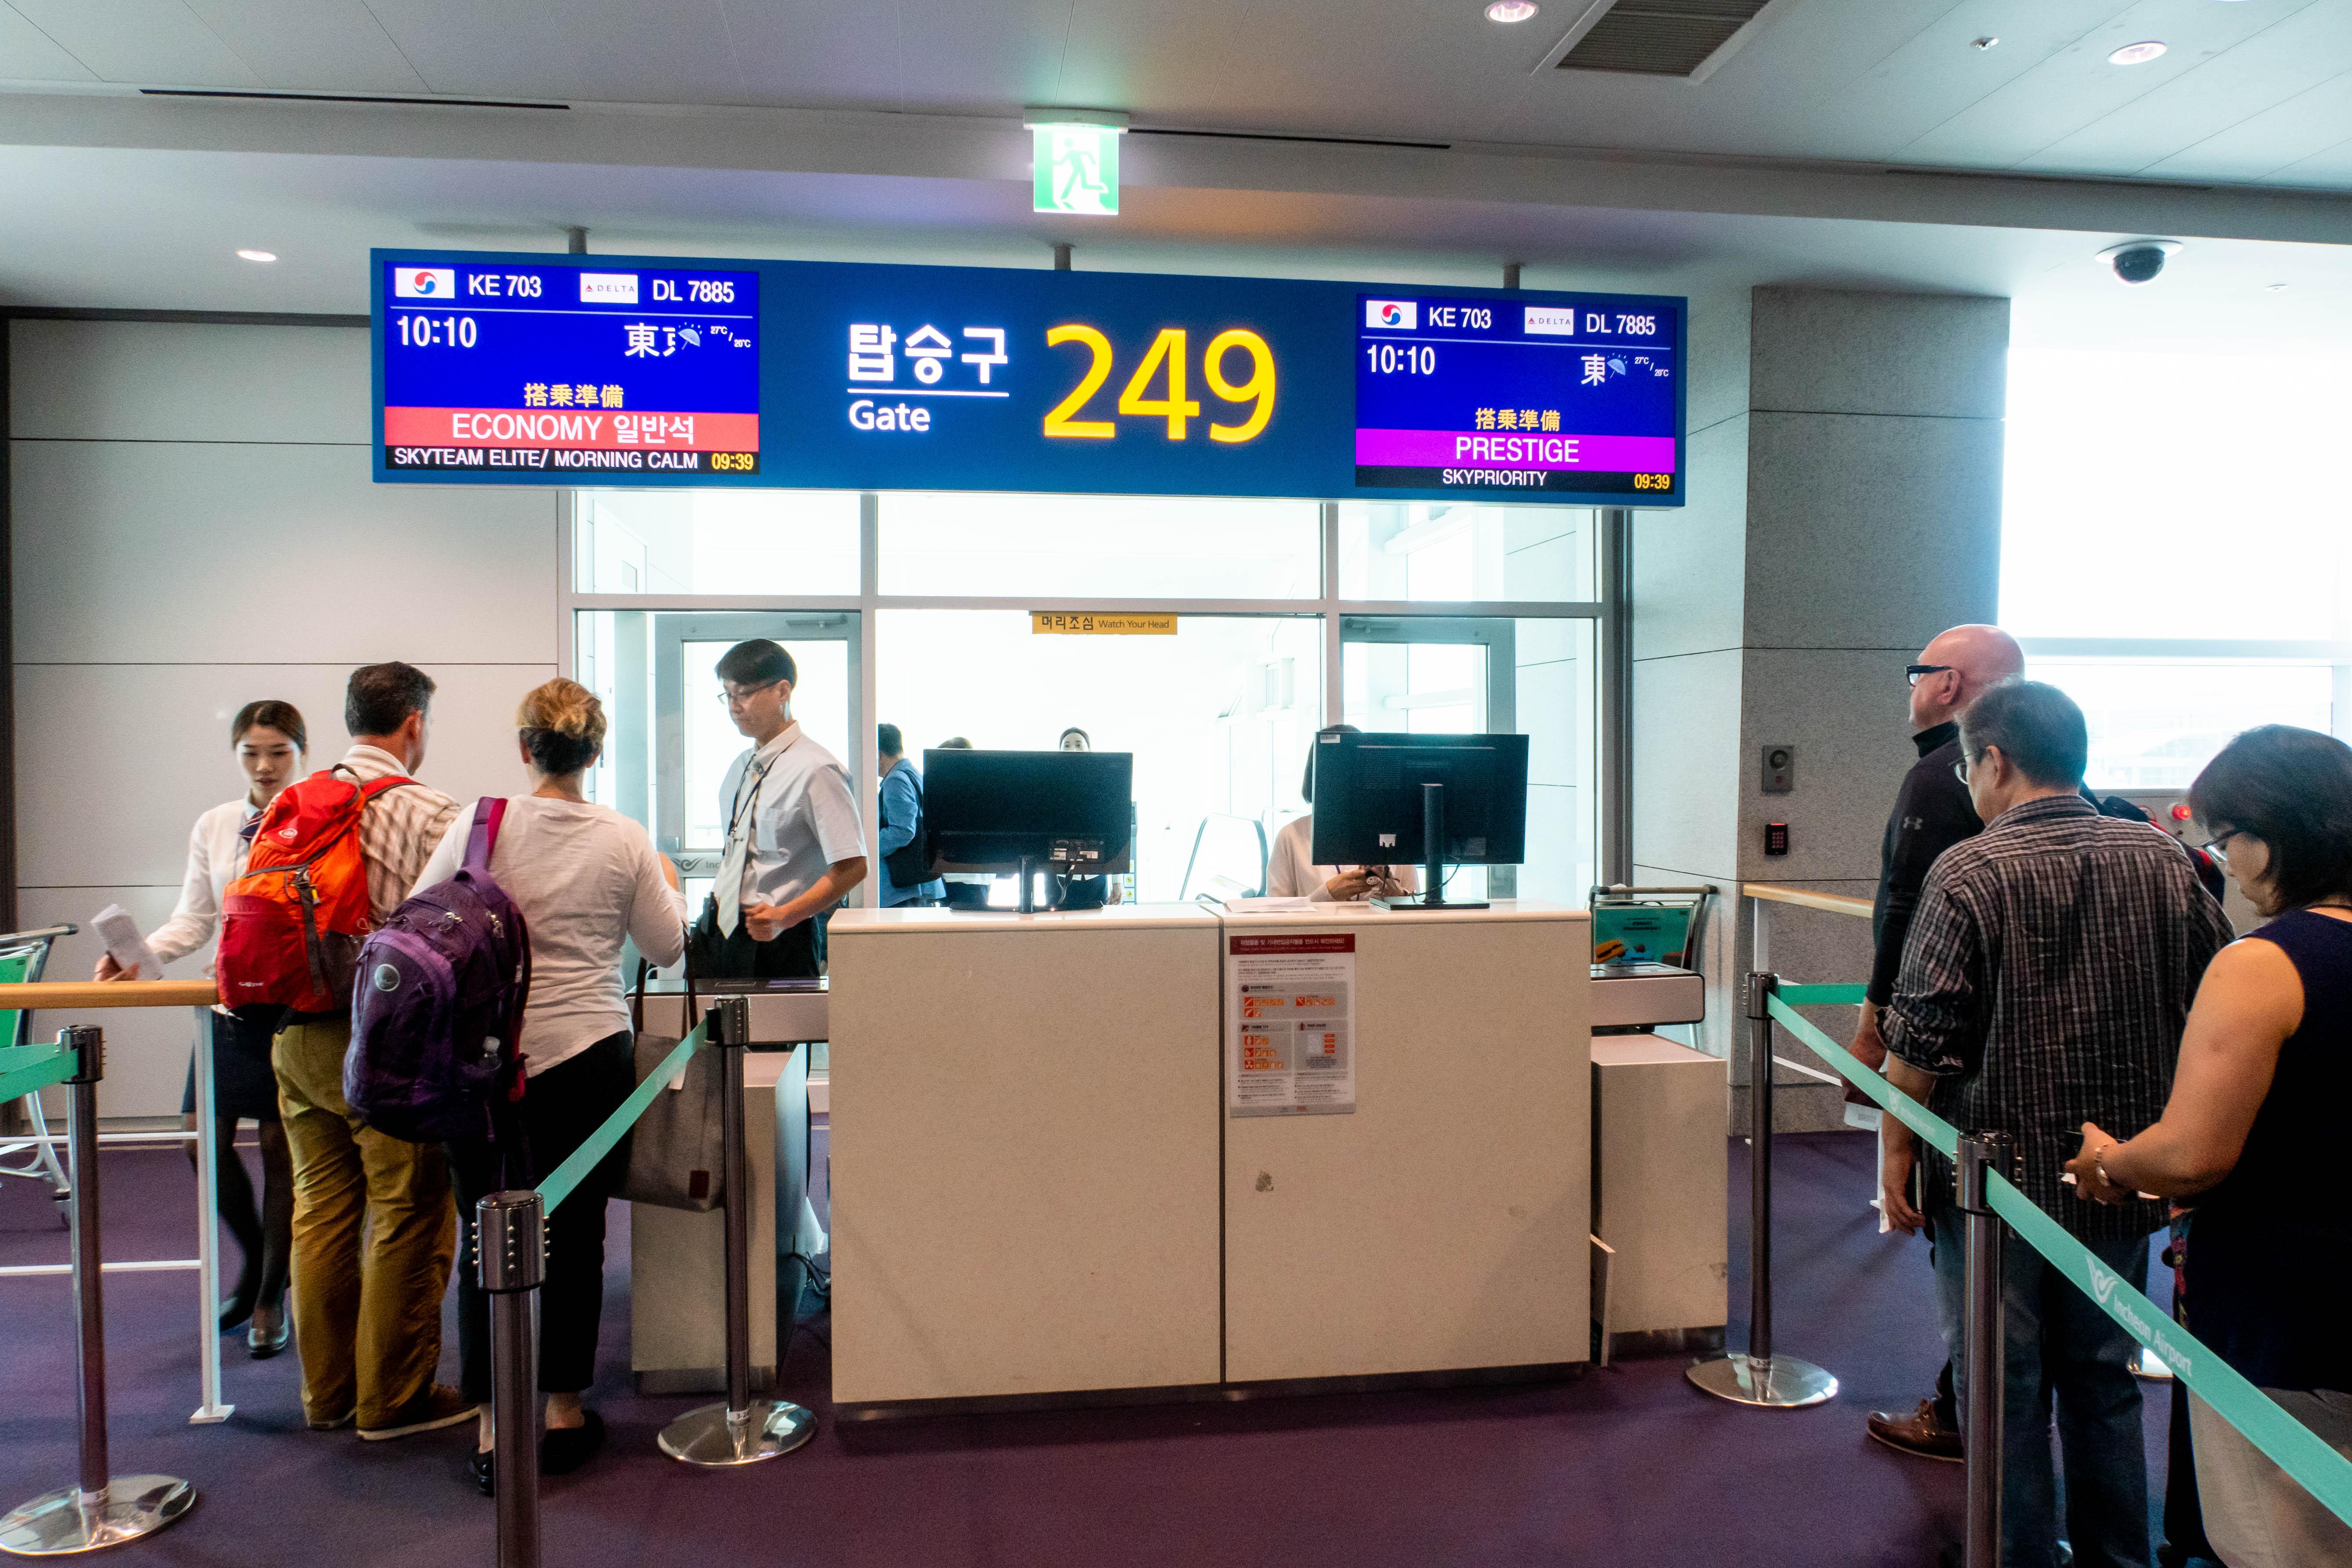 Seoul Incheon Airport Gate 249